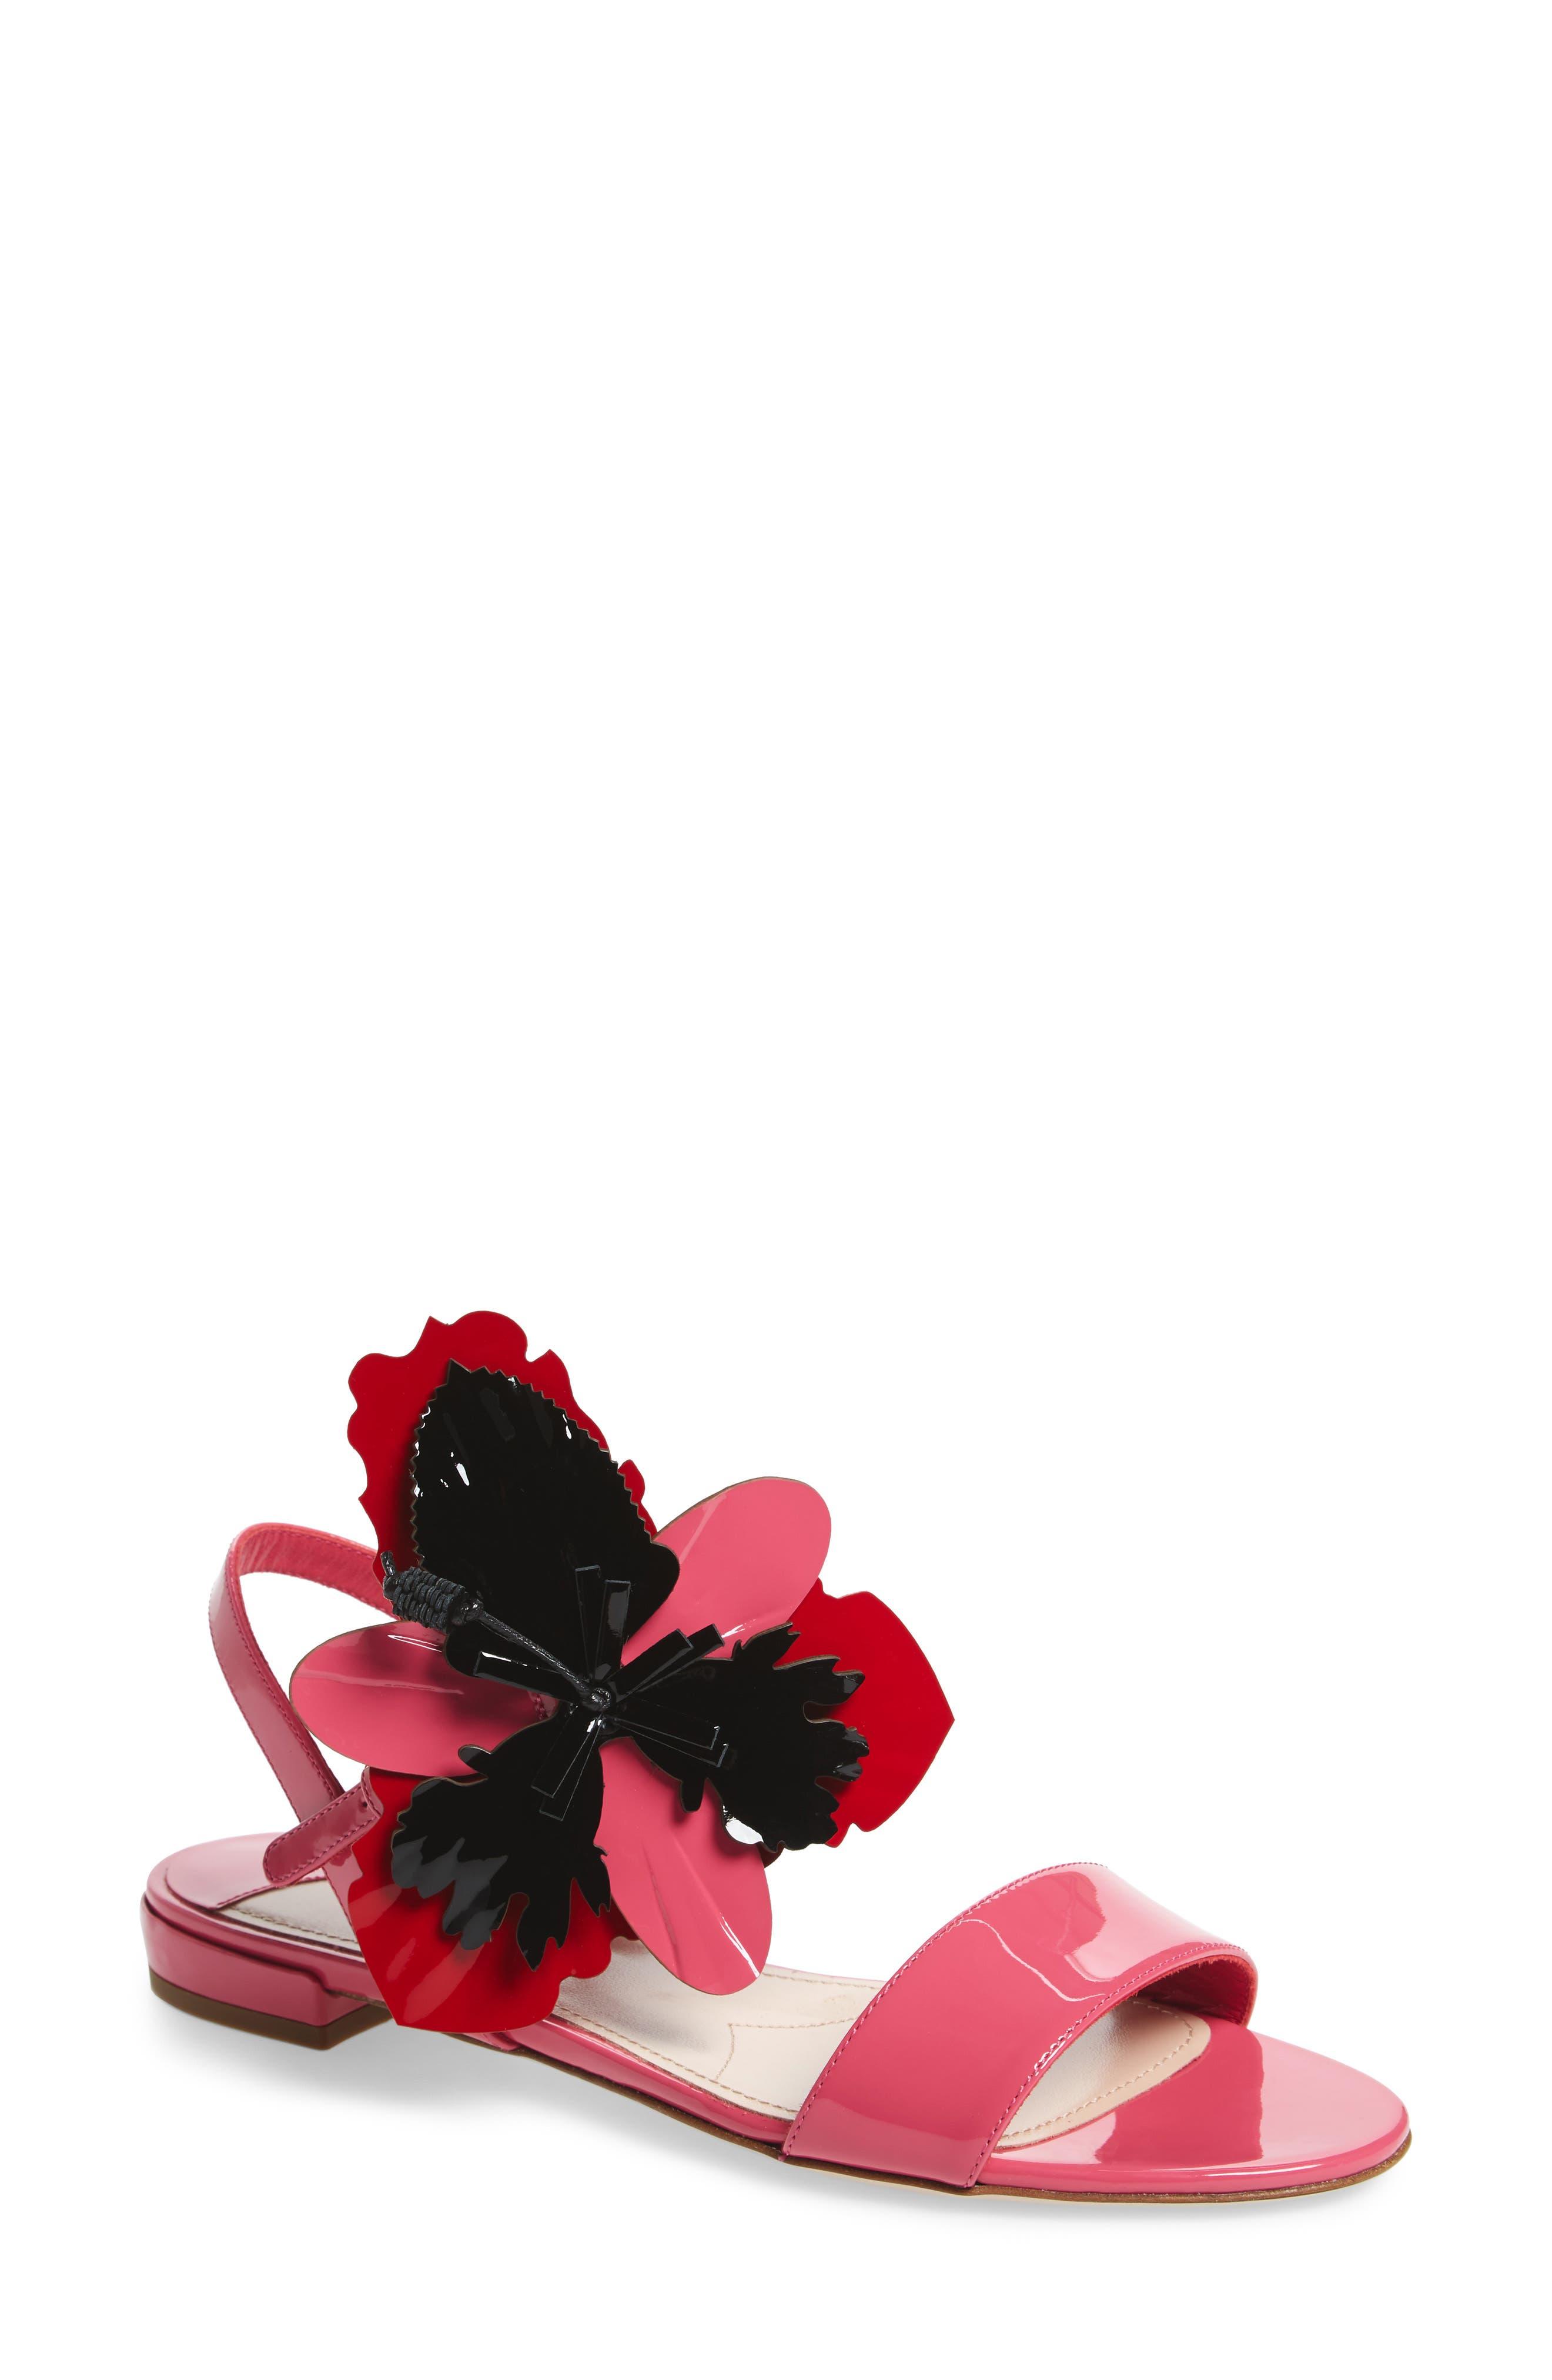 Floral Embellished Strappy Sandal,                             Main thumbnail 1, color,                             Pink